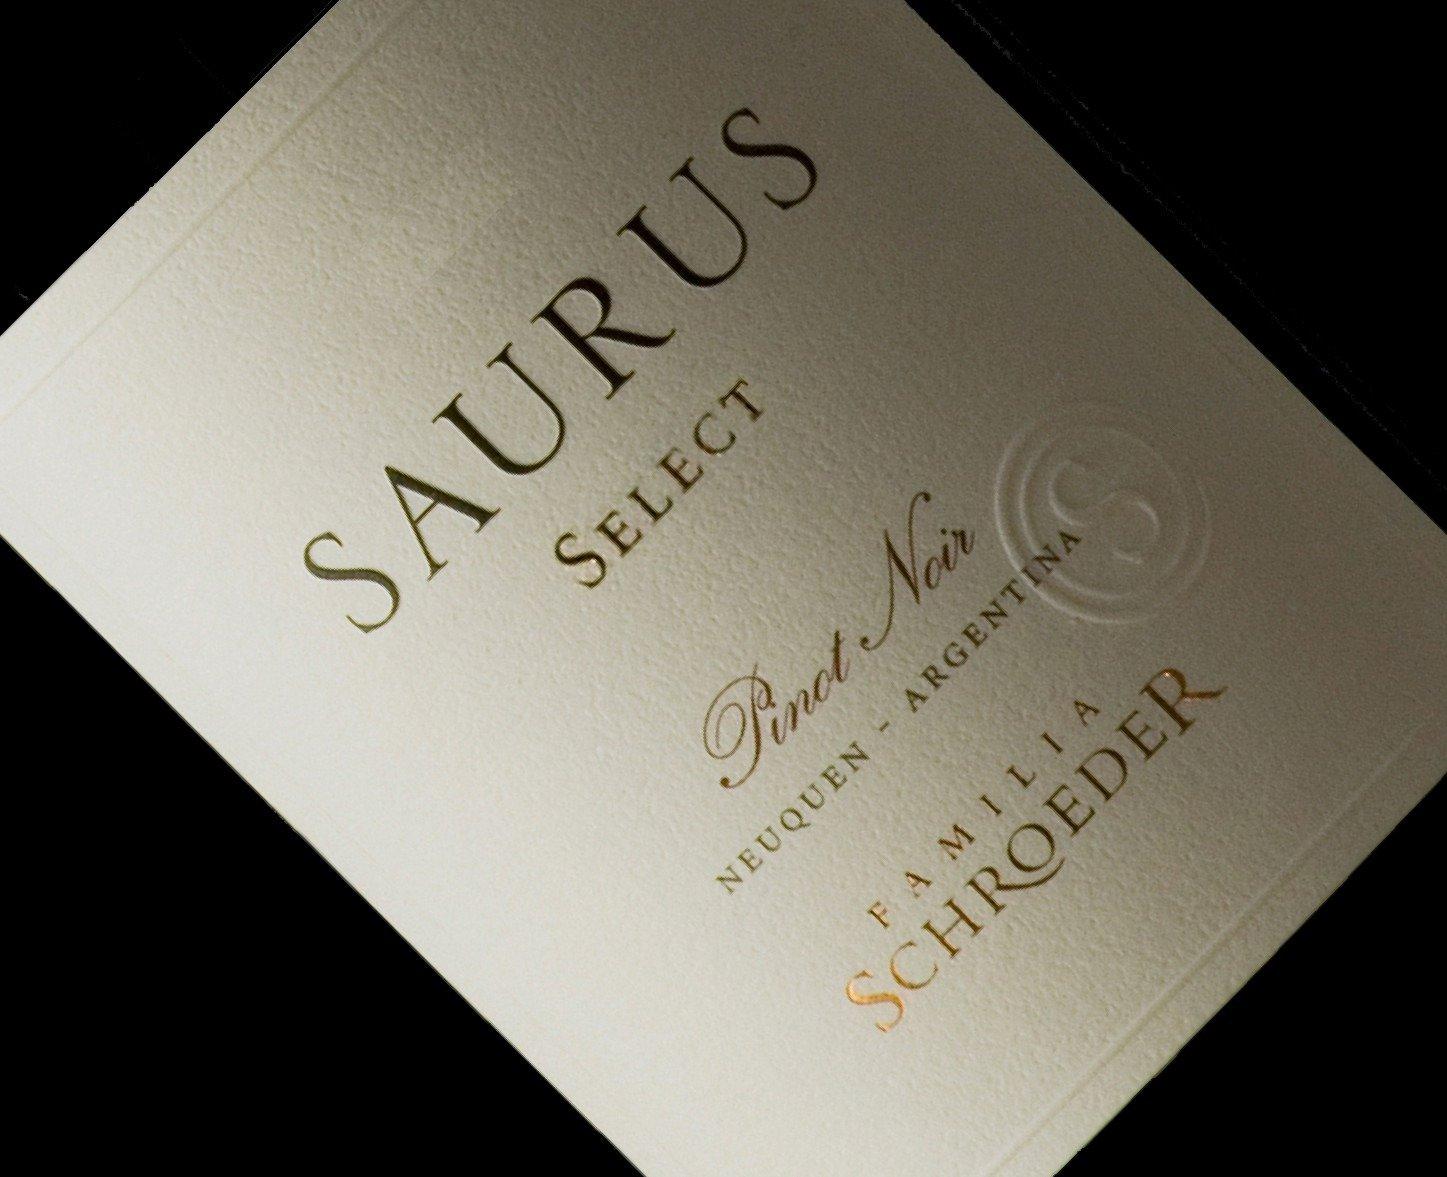 Saurus Select Pinot Noir 2017, de Familia Schroeder